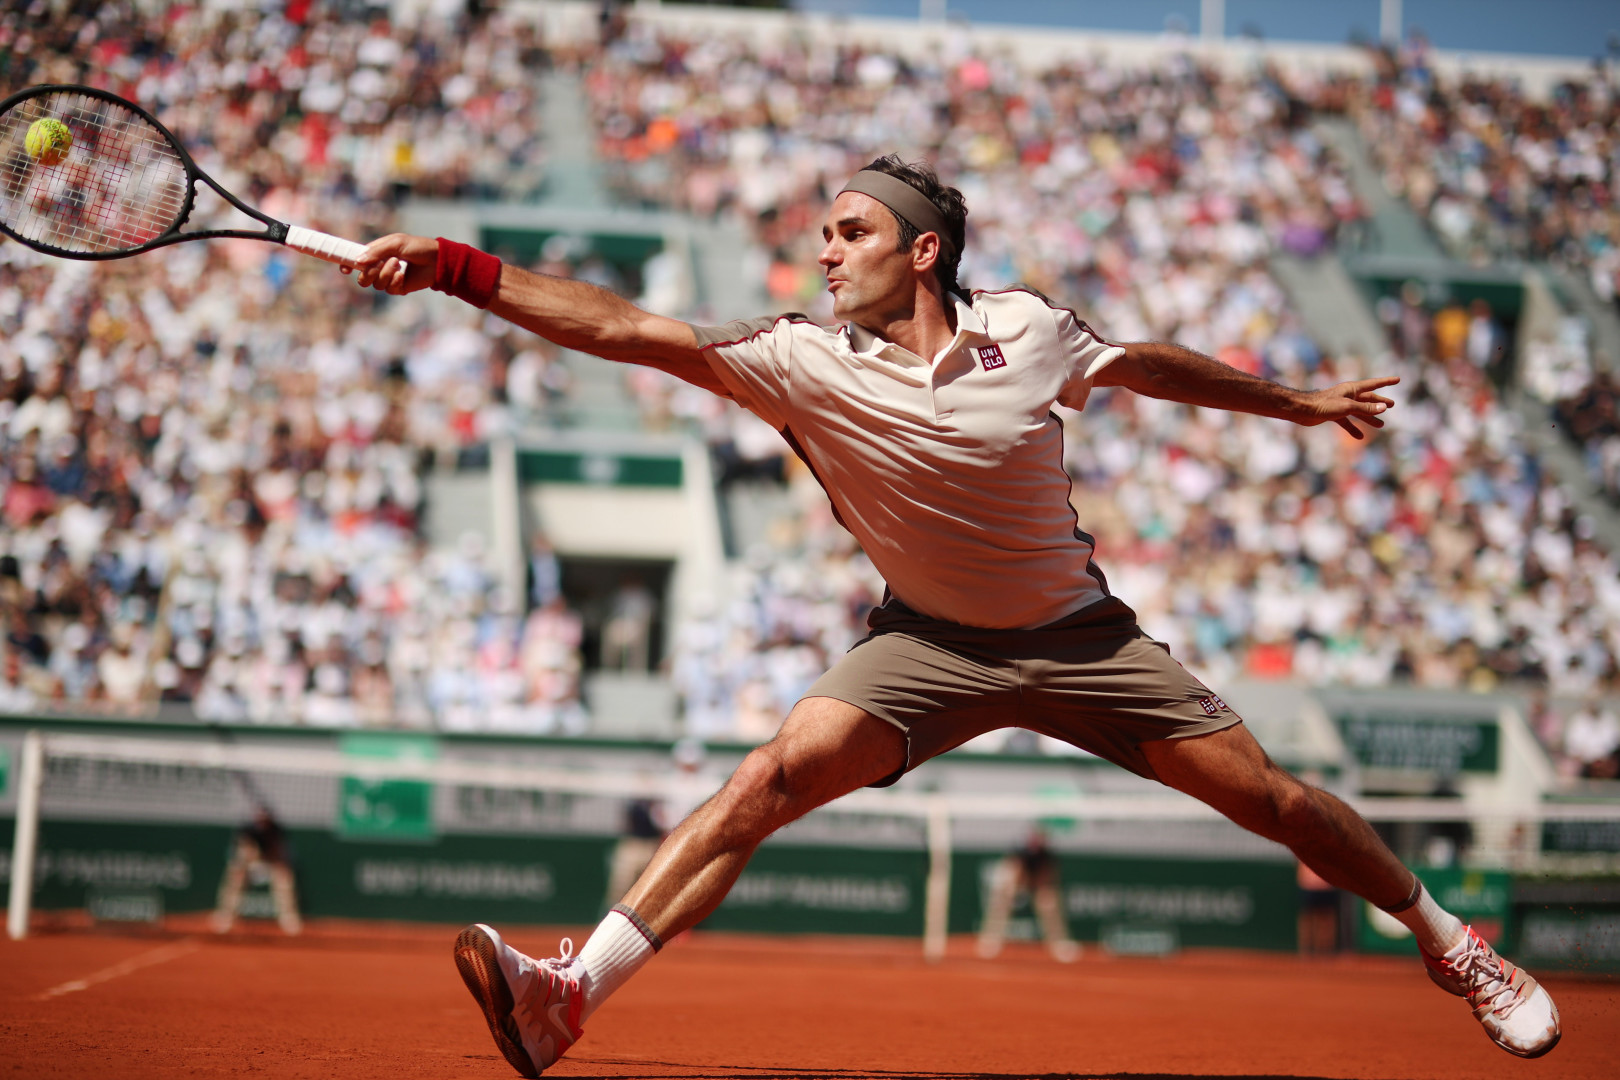 Roger Federer of Switzerland in action against Casper Ruud of Norway (optimized)